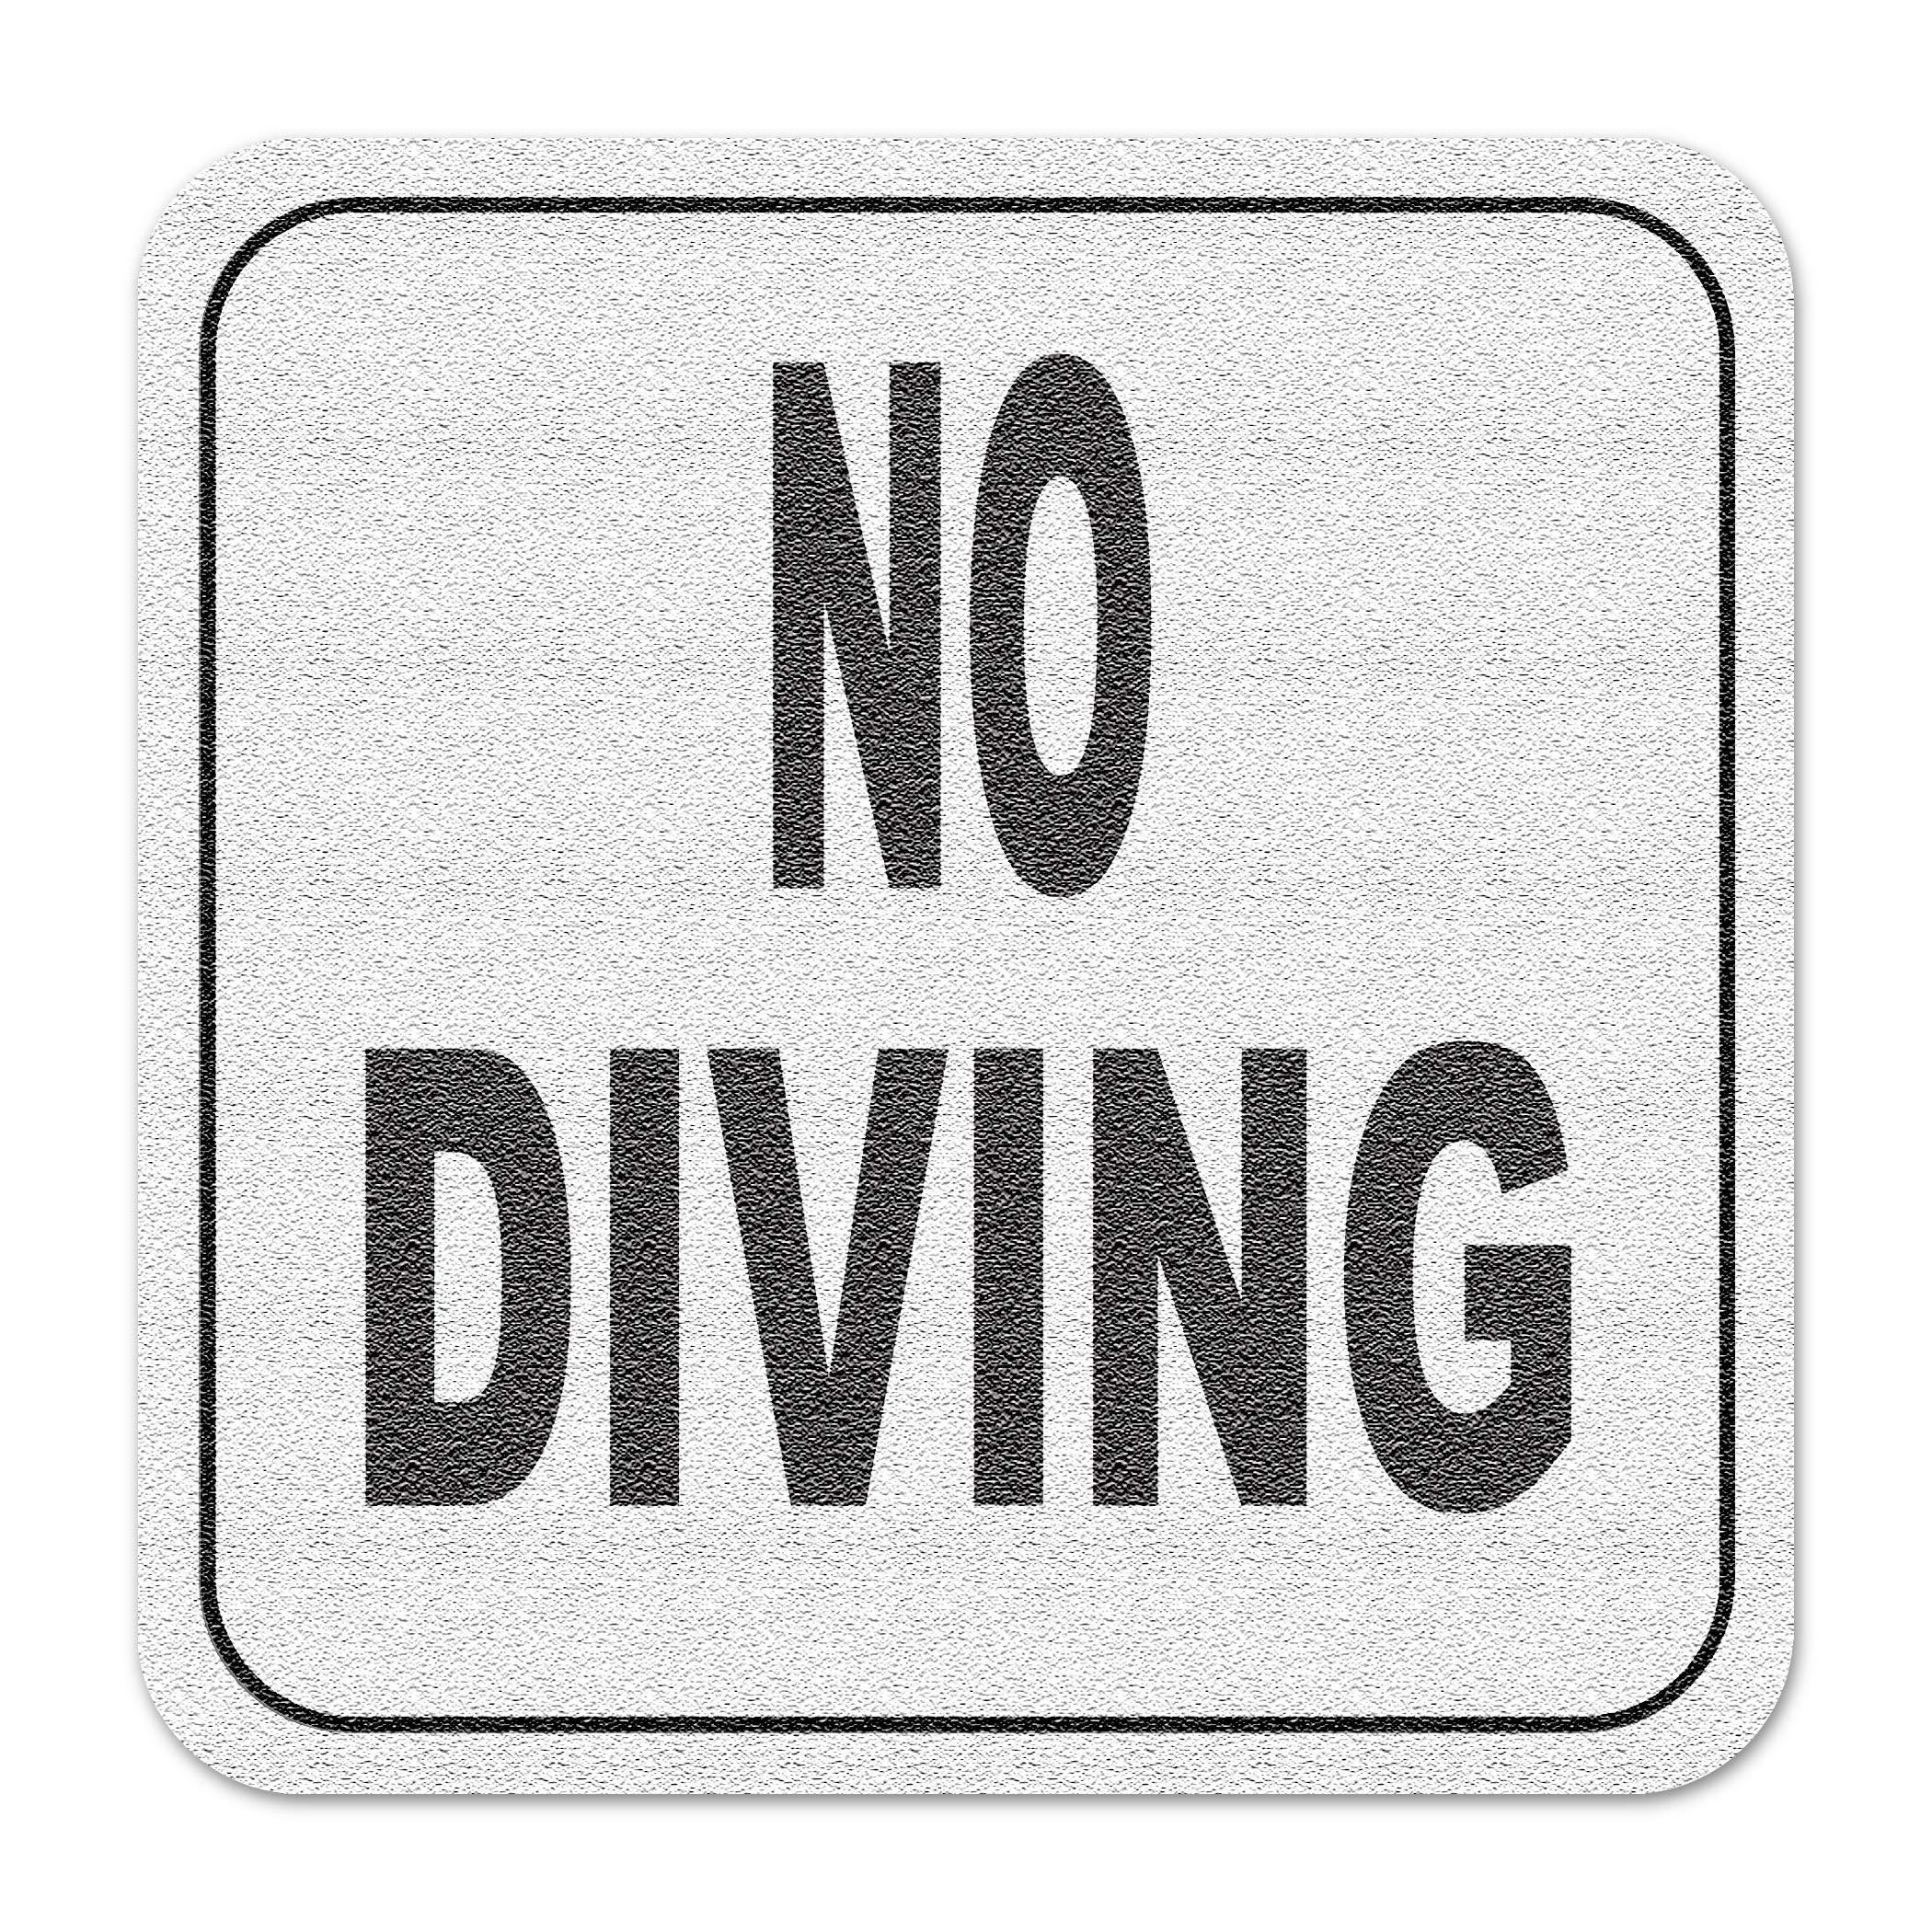 Aquatic Custom Tile Vinyl 3M Adhesive Swimming Pool Deck Depth Marker No Diving Text only, Non-Slip by Aquatic Custom Tile